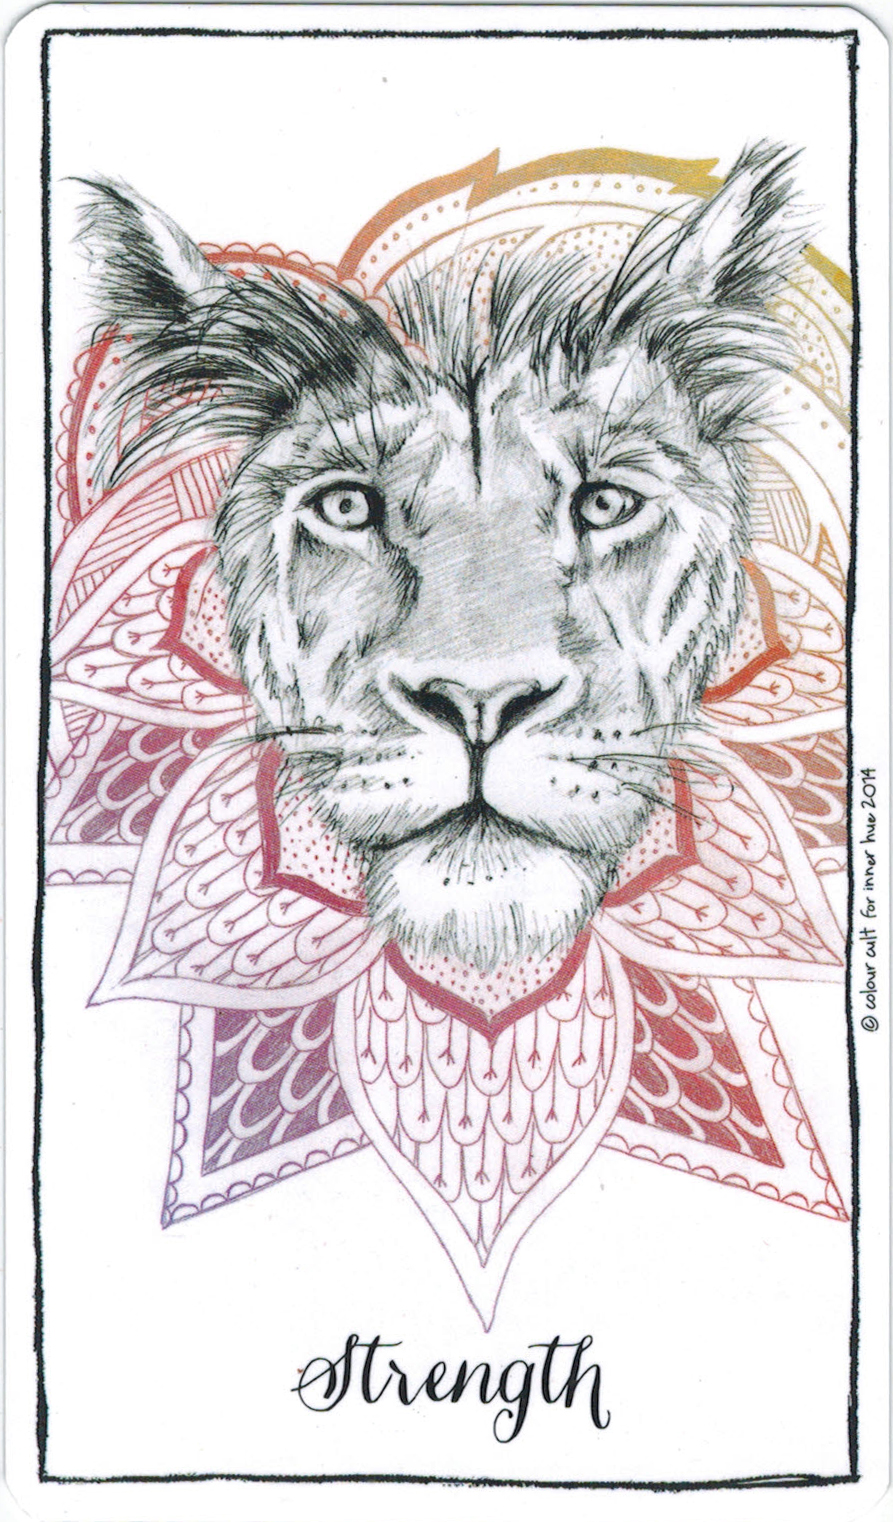 Ý nghĩa lá Strength trong bộ bài Connected & Free - The Alchemist's Oracle